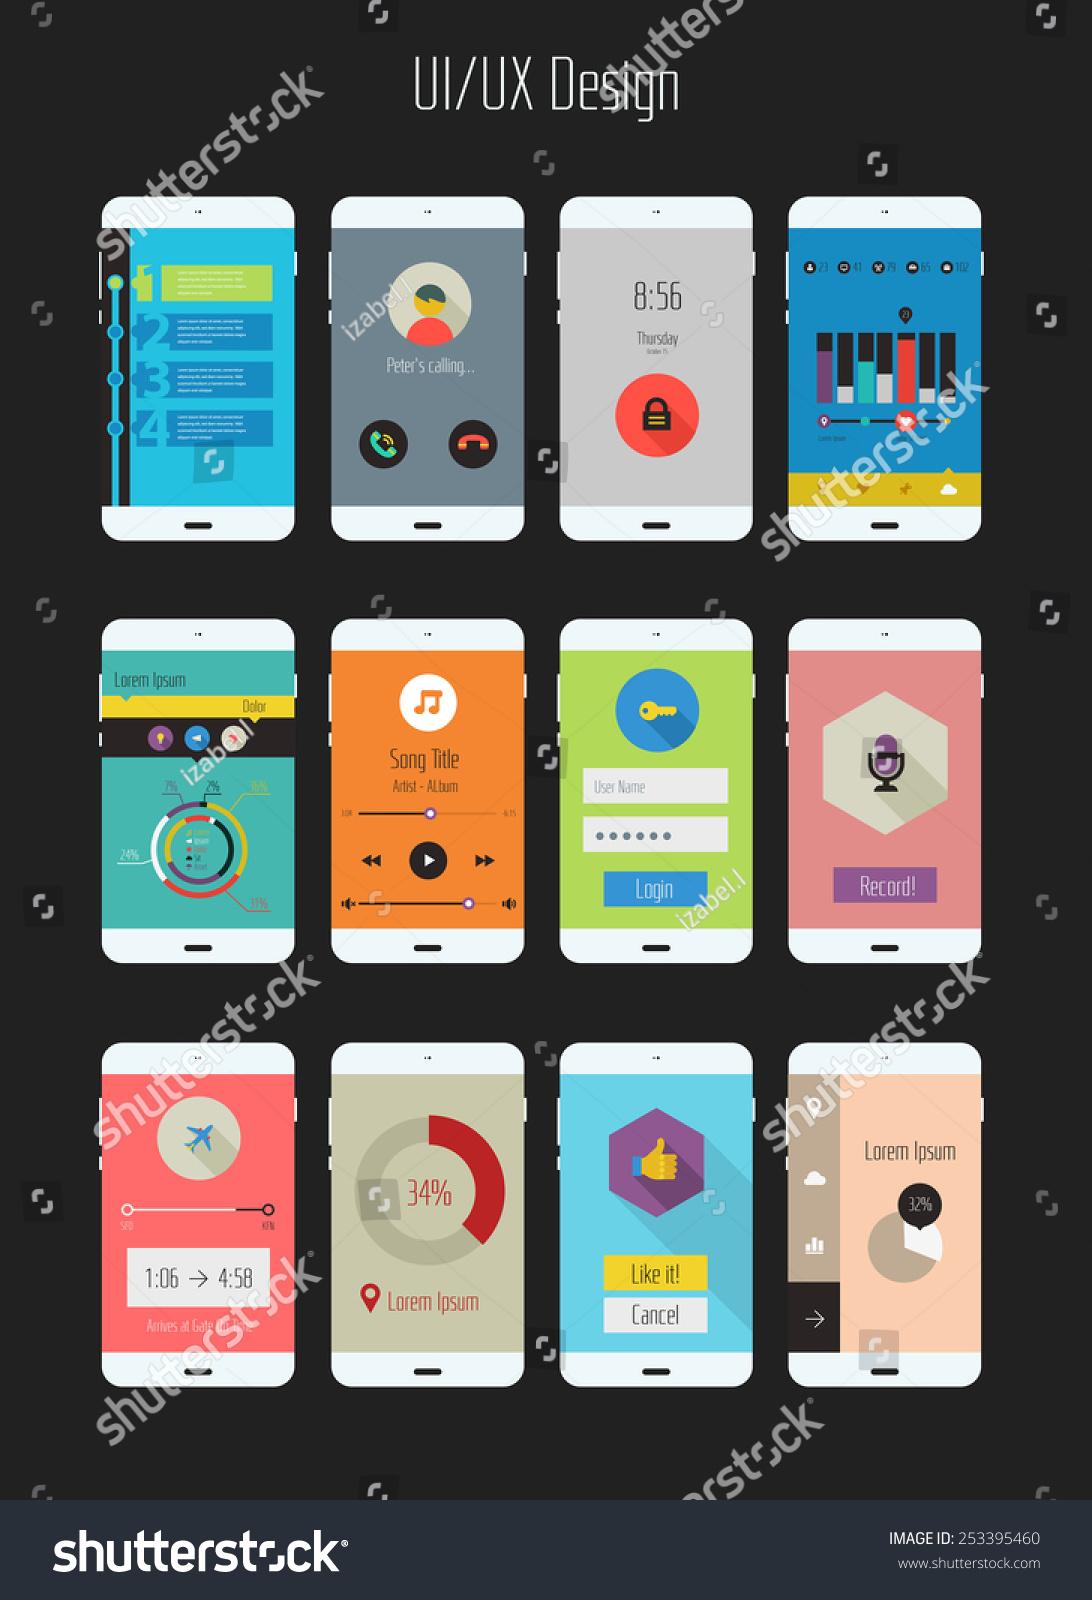 Flat Design Uiux Mobile Application Templates Stock Vector